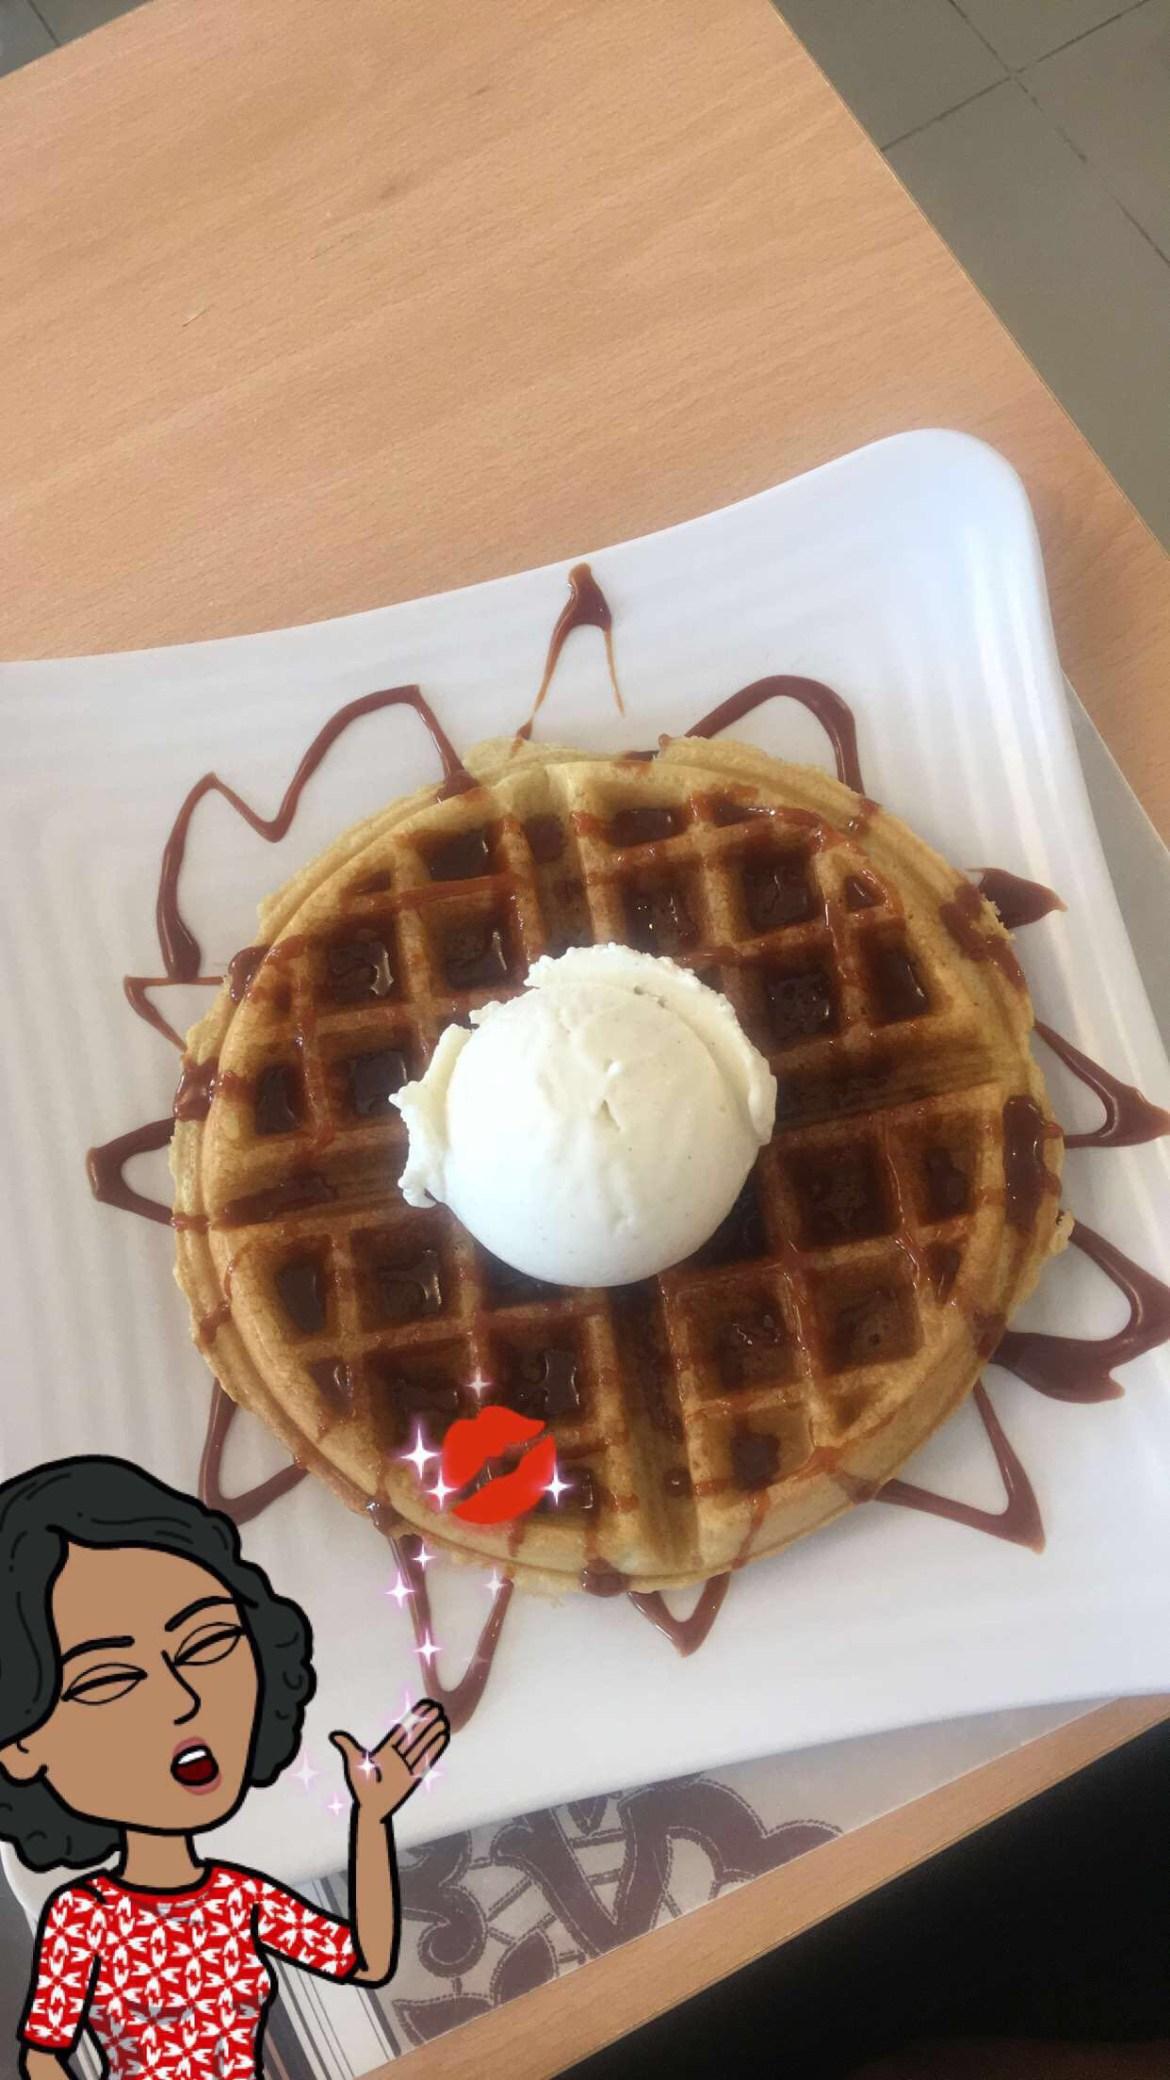 Chloe's Waffles & Icecream 